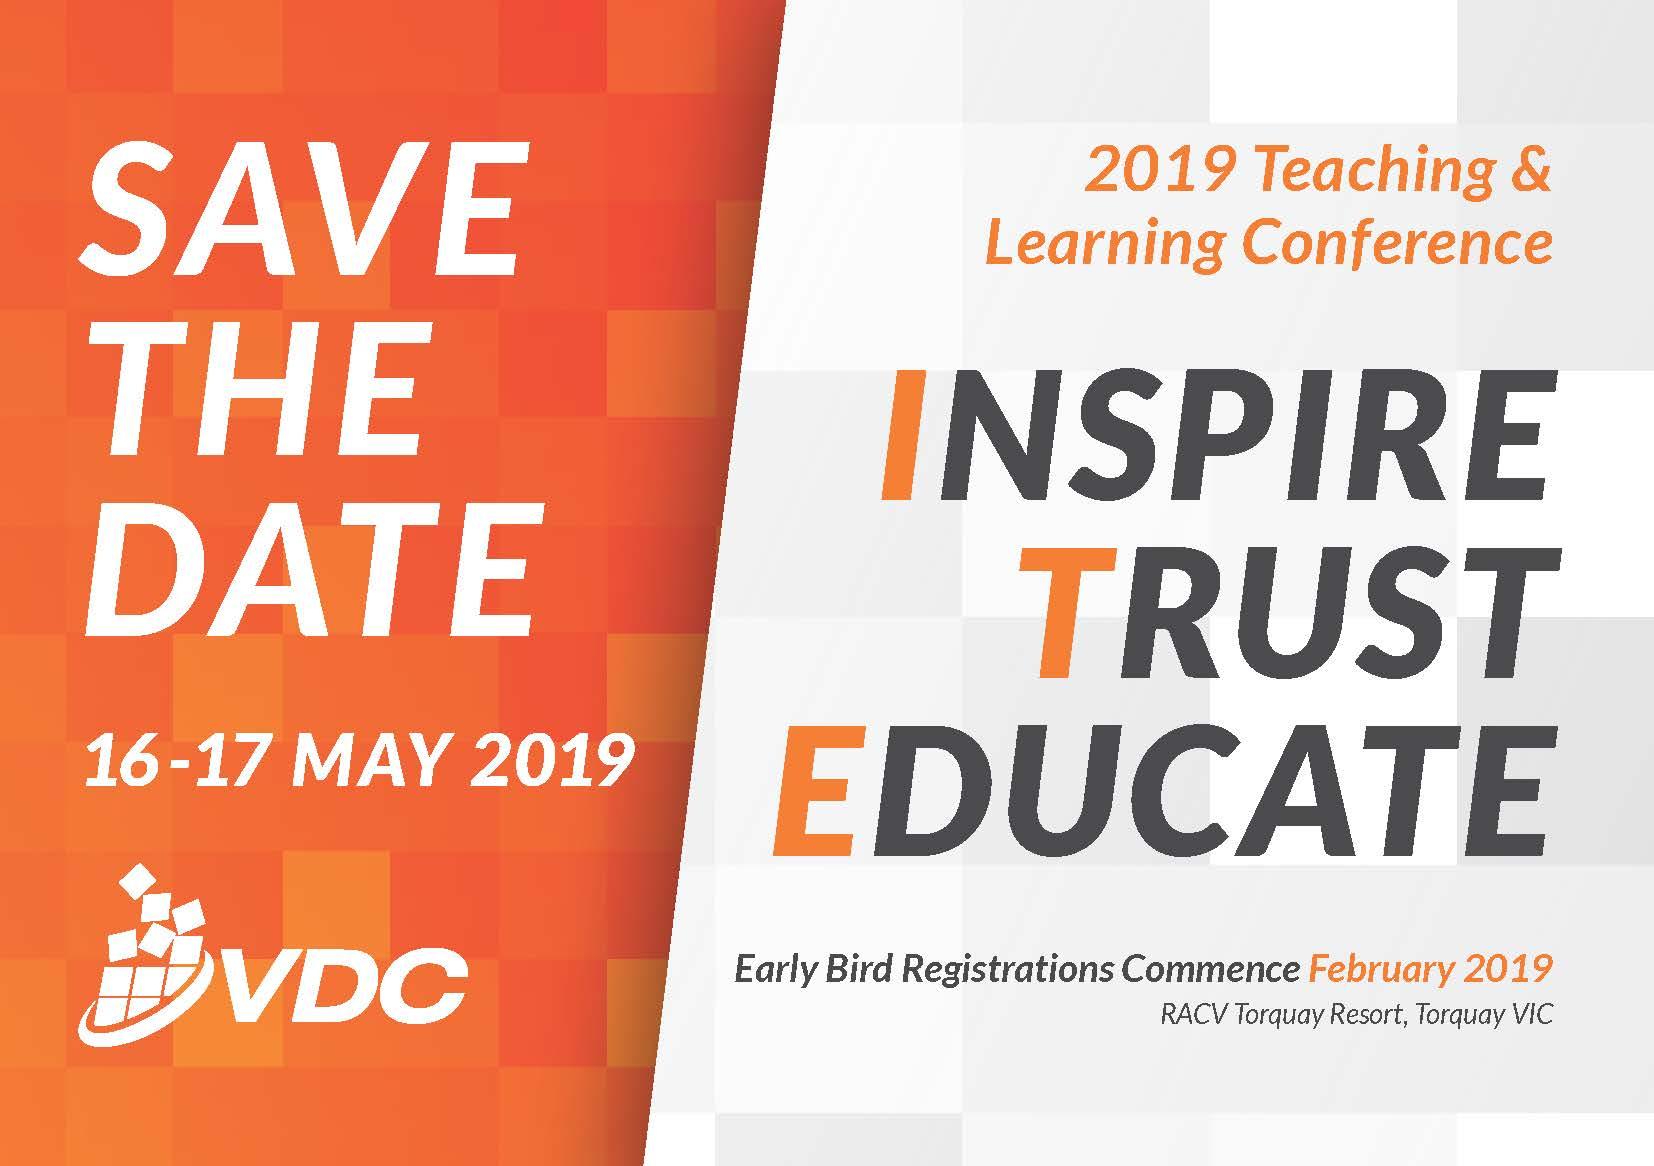 S5992 VDC 2019 Conference -Save The Date- Flyer_v3